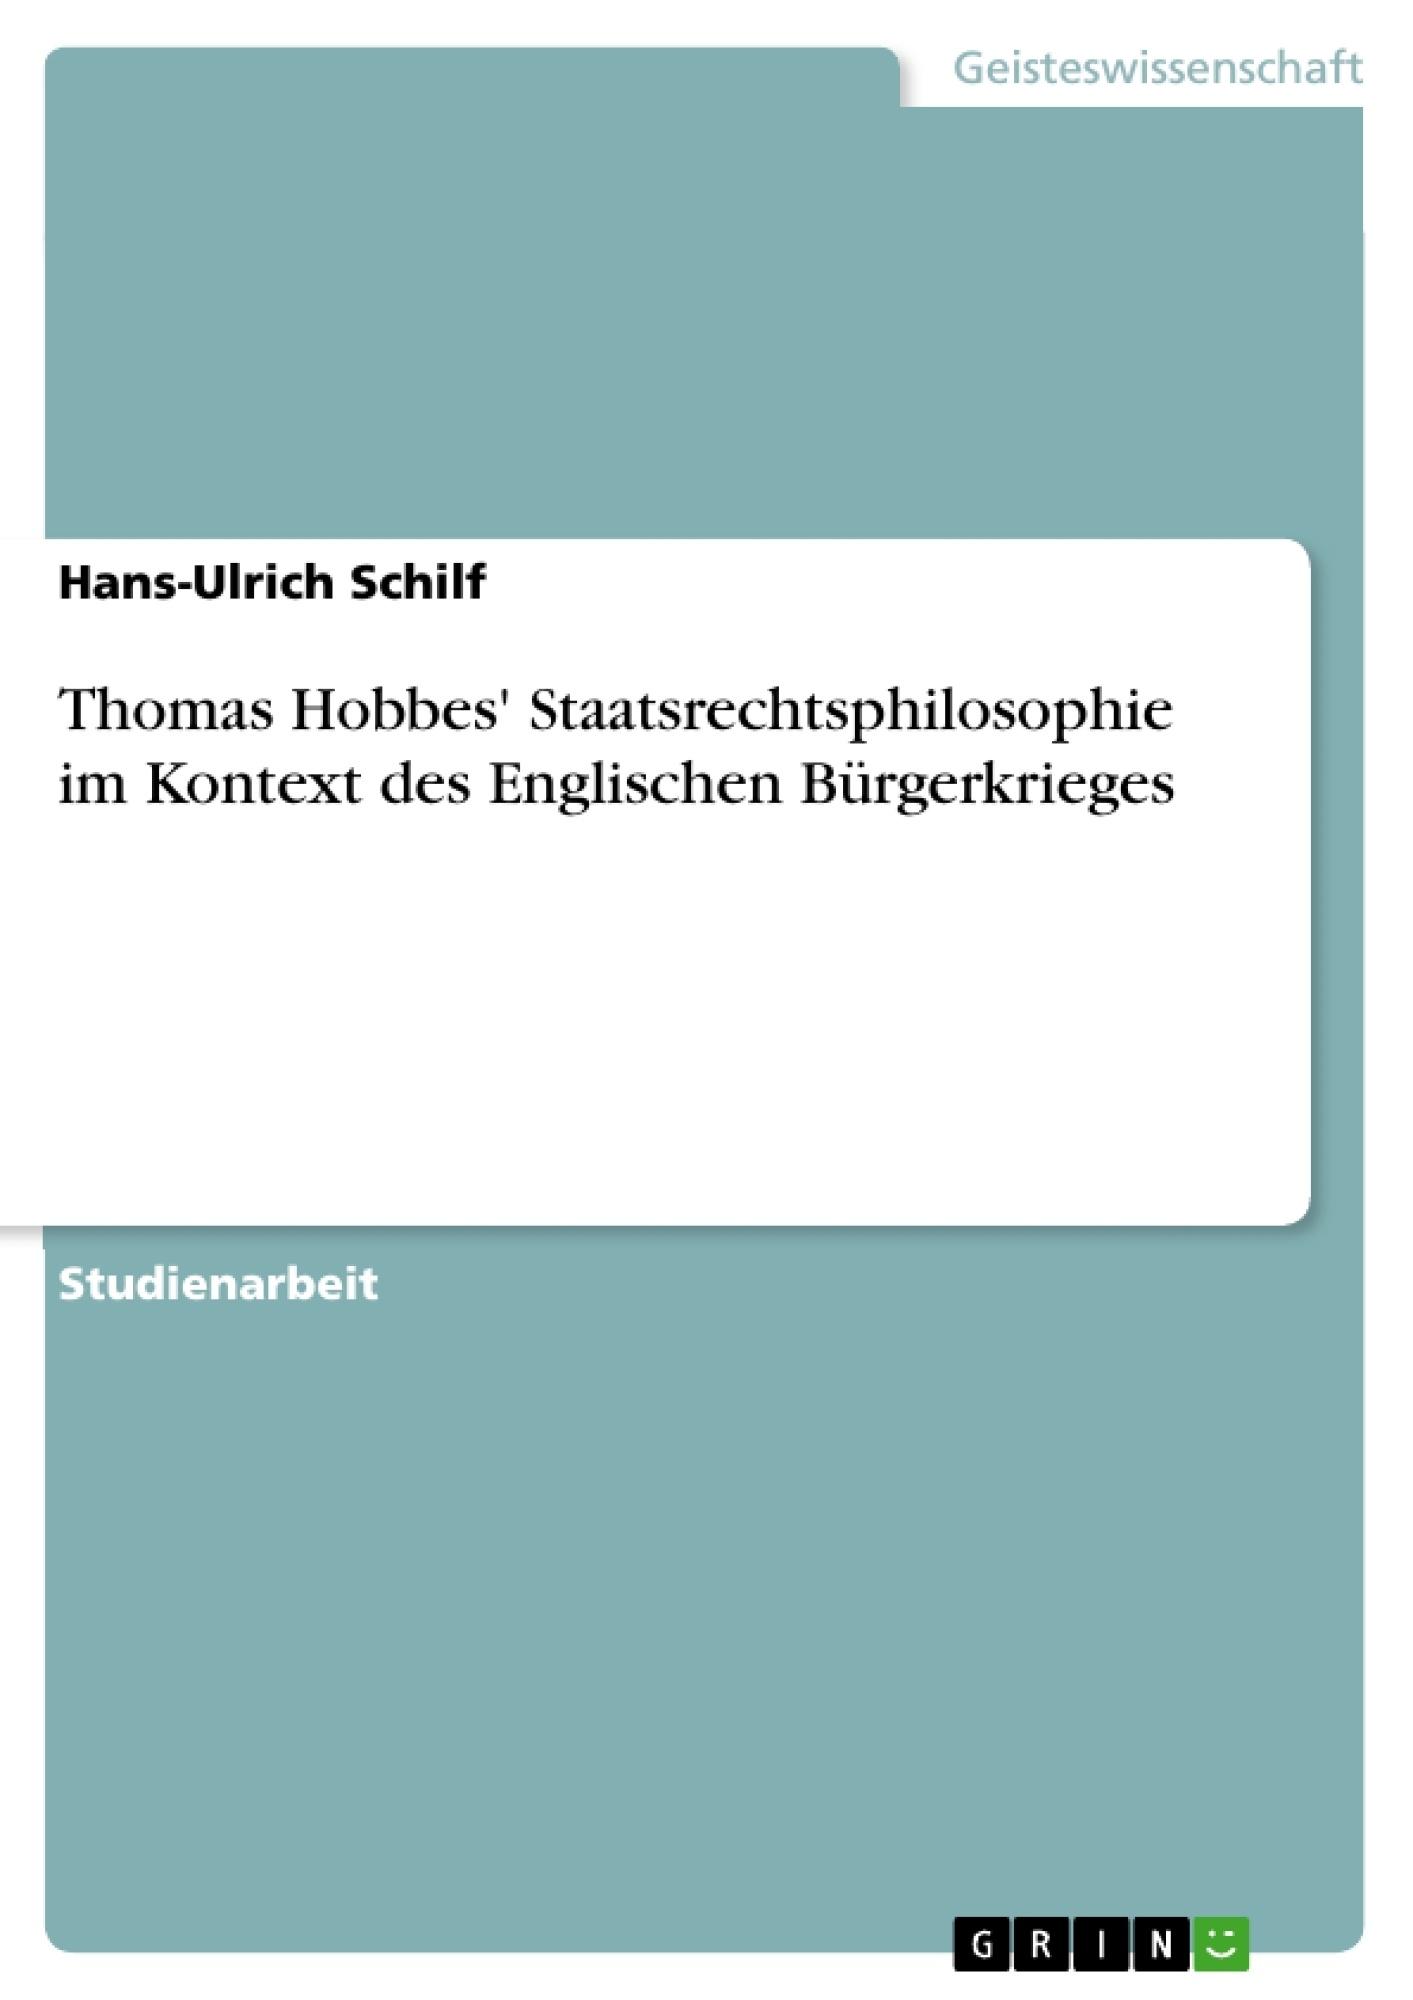 Titel: Thomas Hobbes' Staatsrechtsphilosophie im Kontext des Englischen Bürgerkrieges